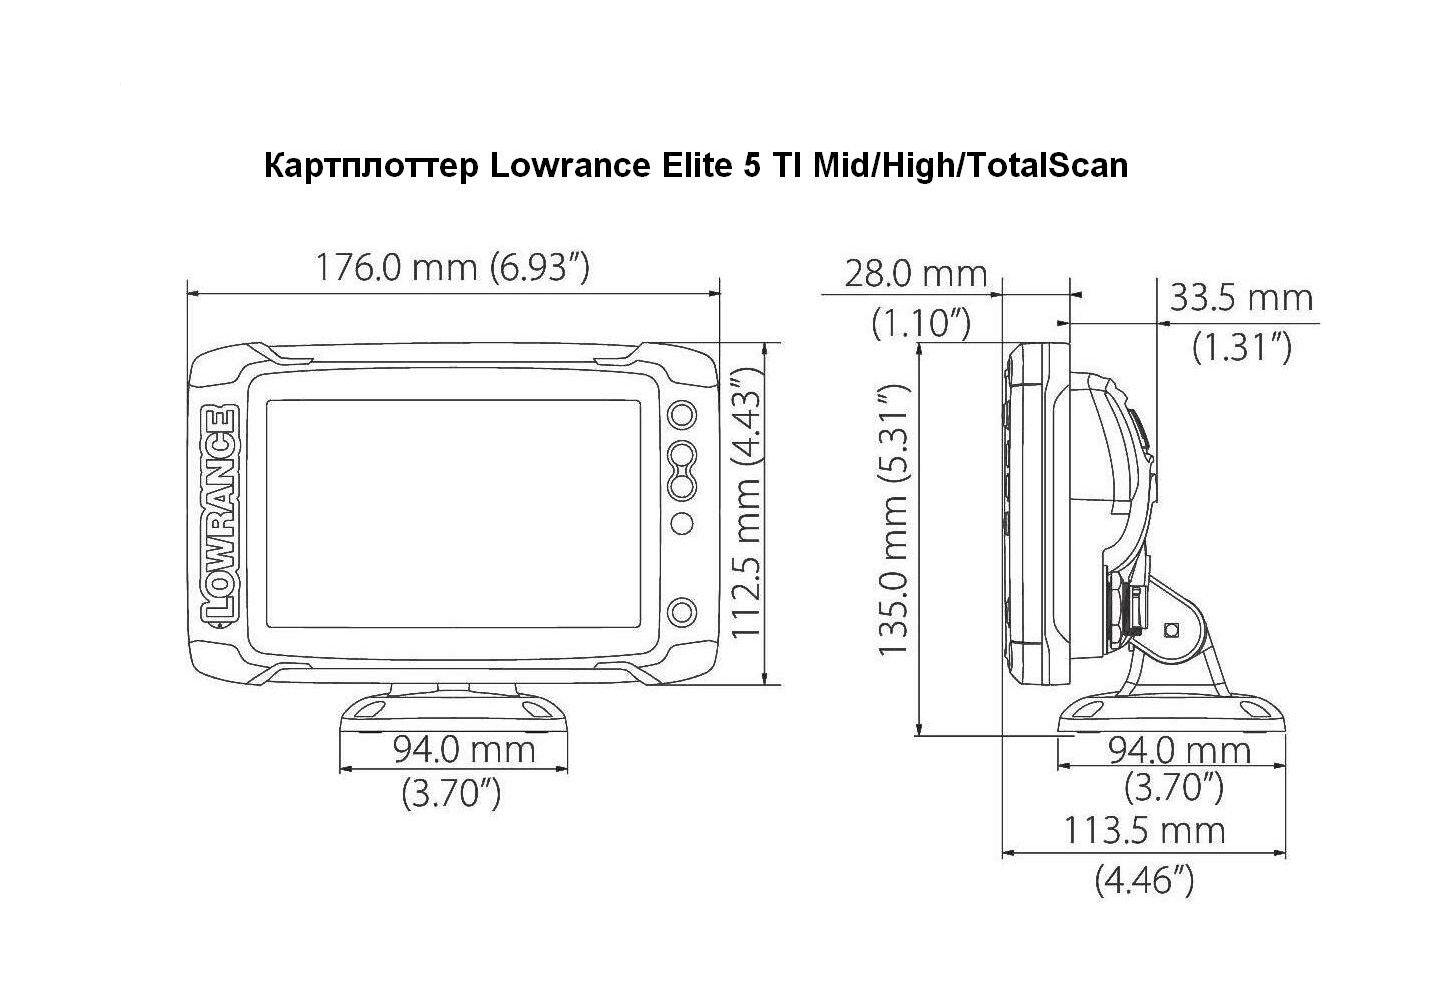 Chartplotter Lowrance Elite 5 Ti Mid High Totalscan Chirp Wiring Diagram 1 Next